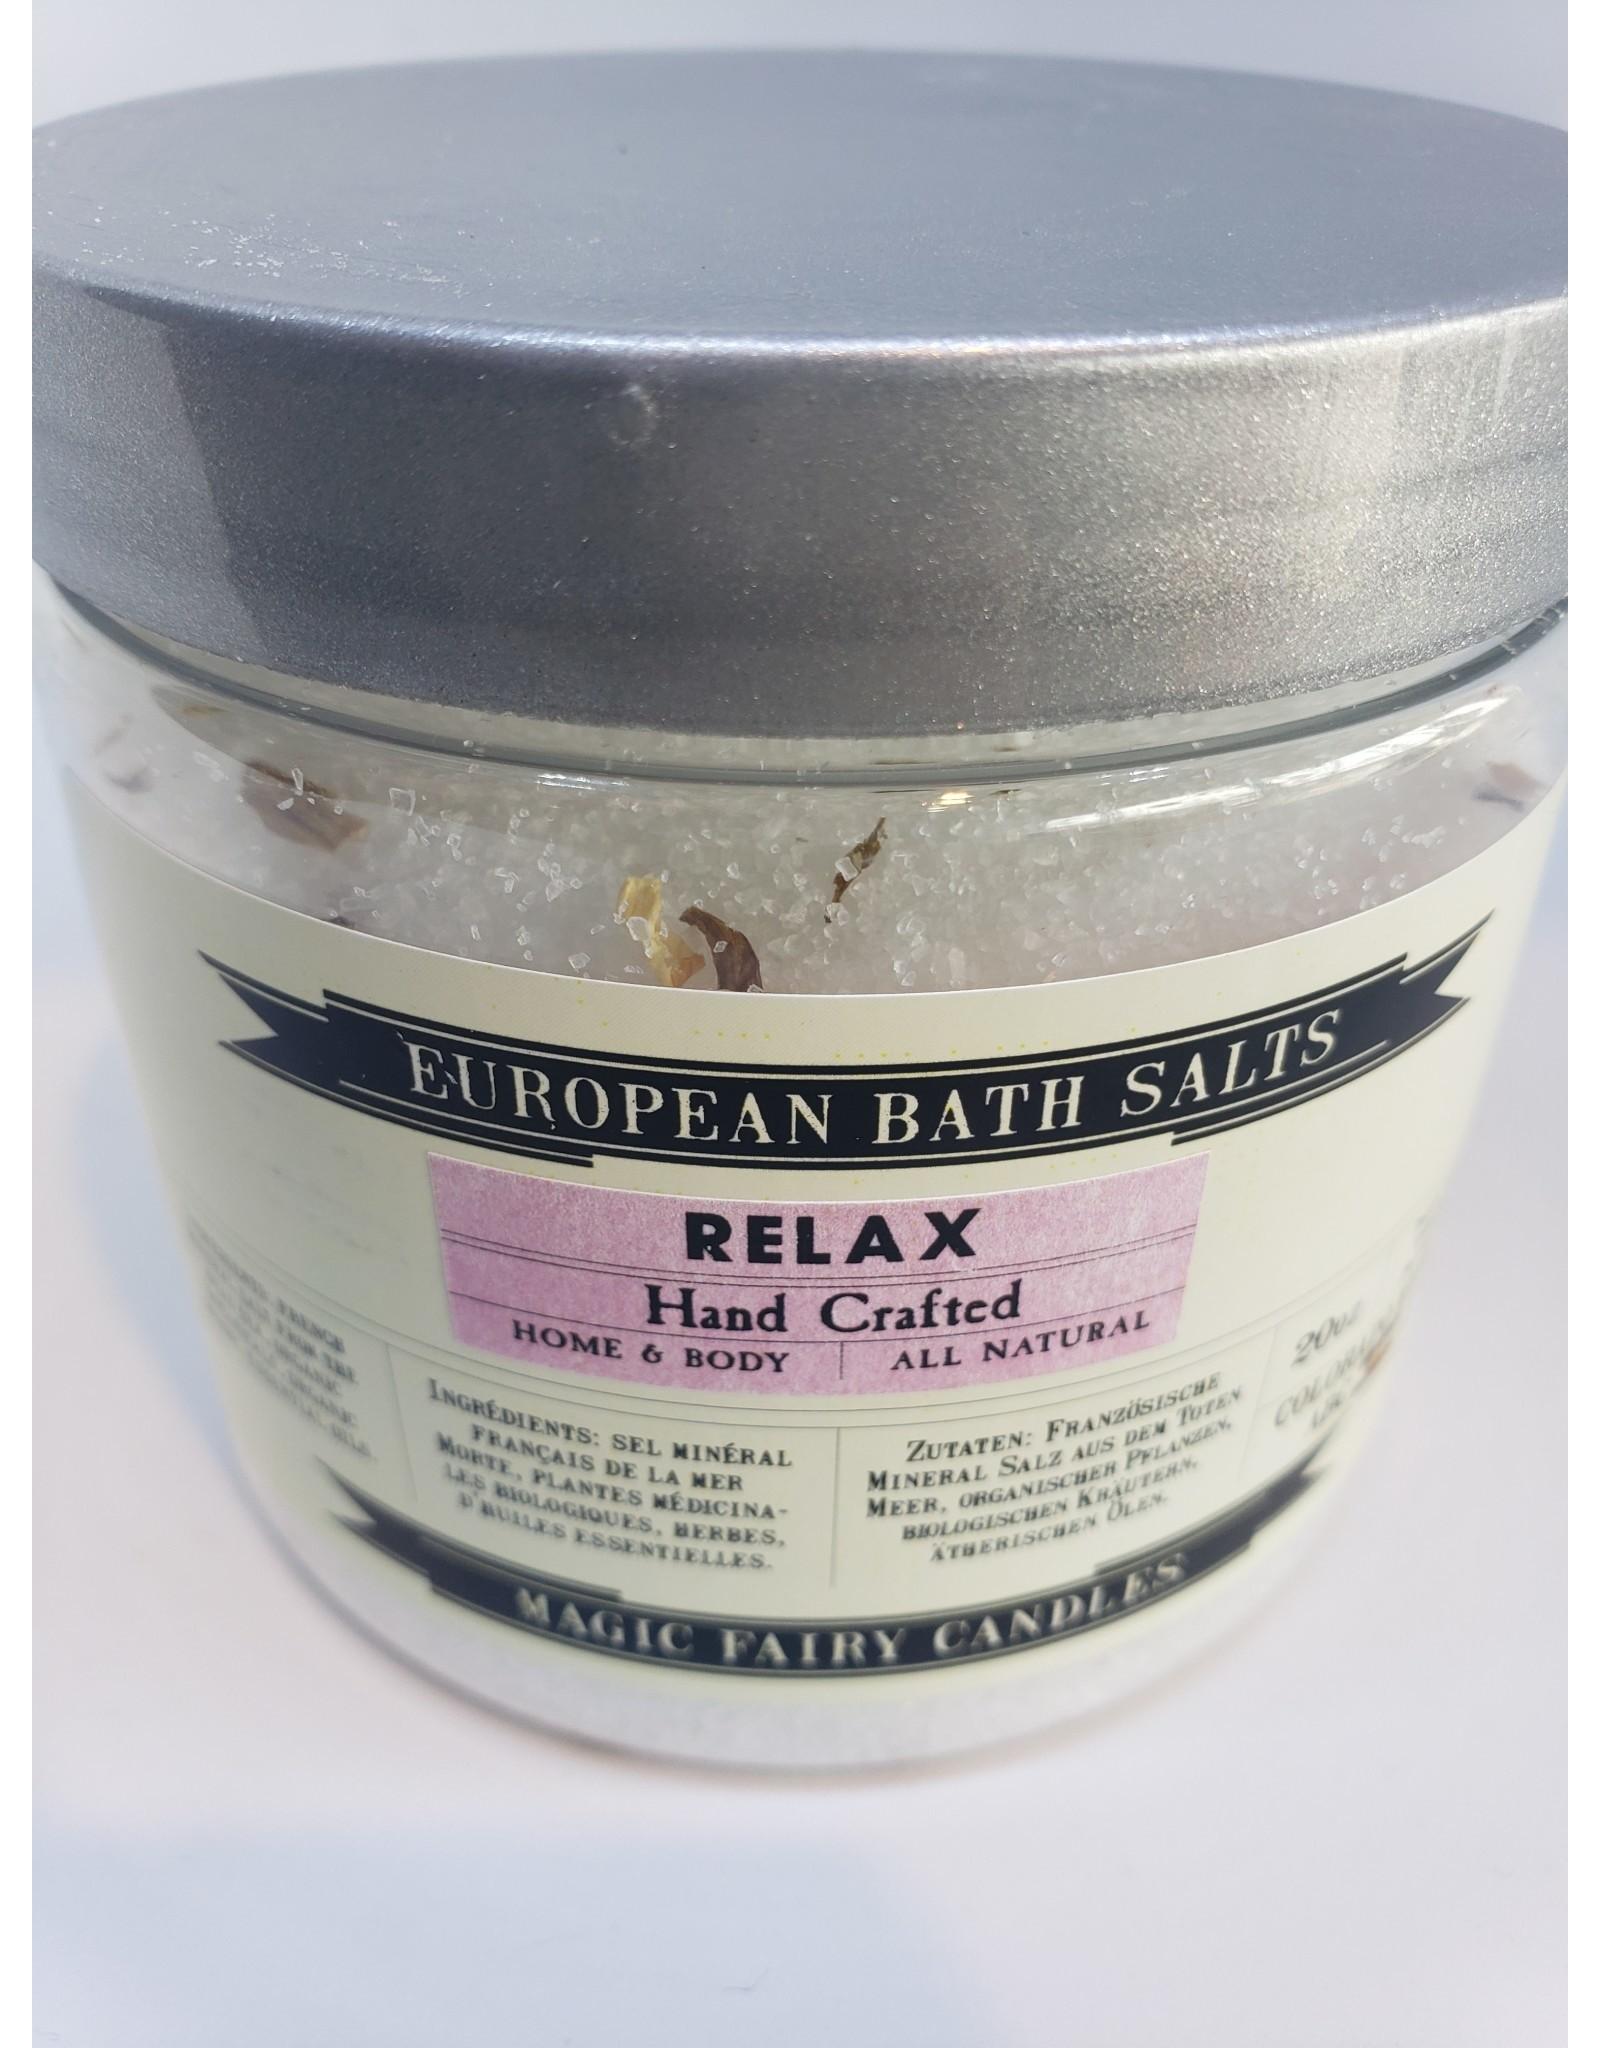 Bath Salt 16 oz. - Relax